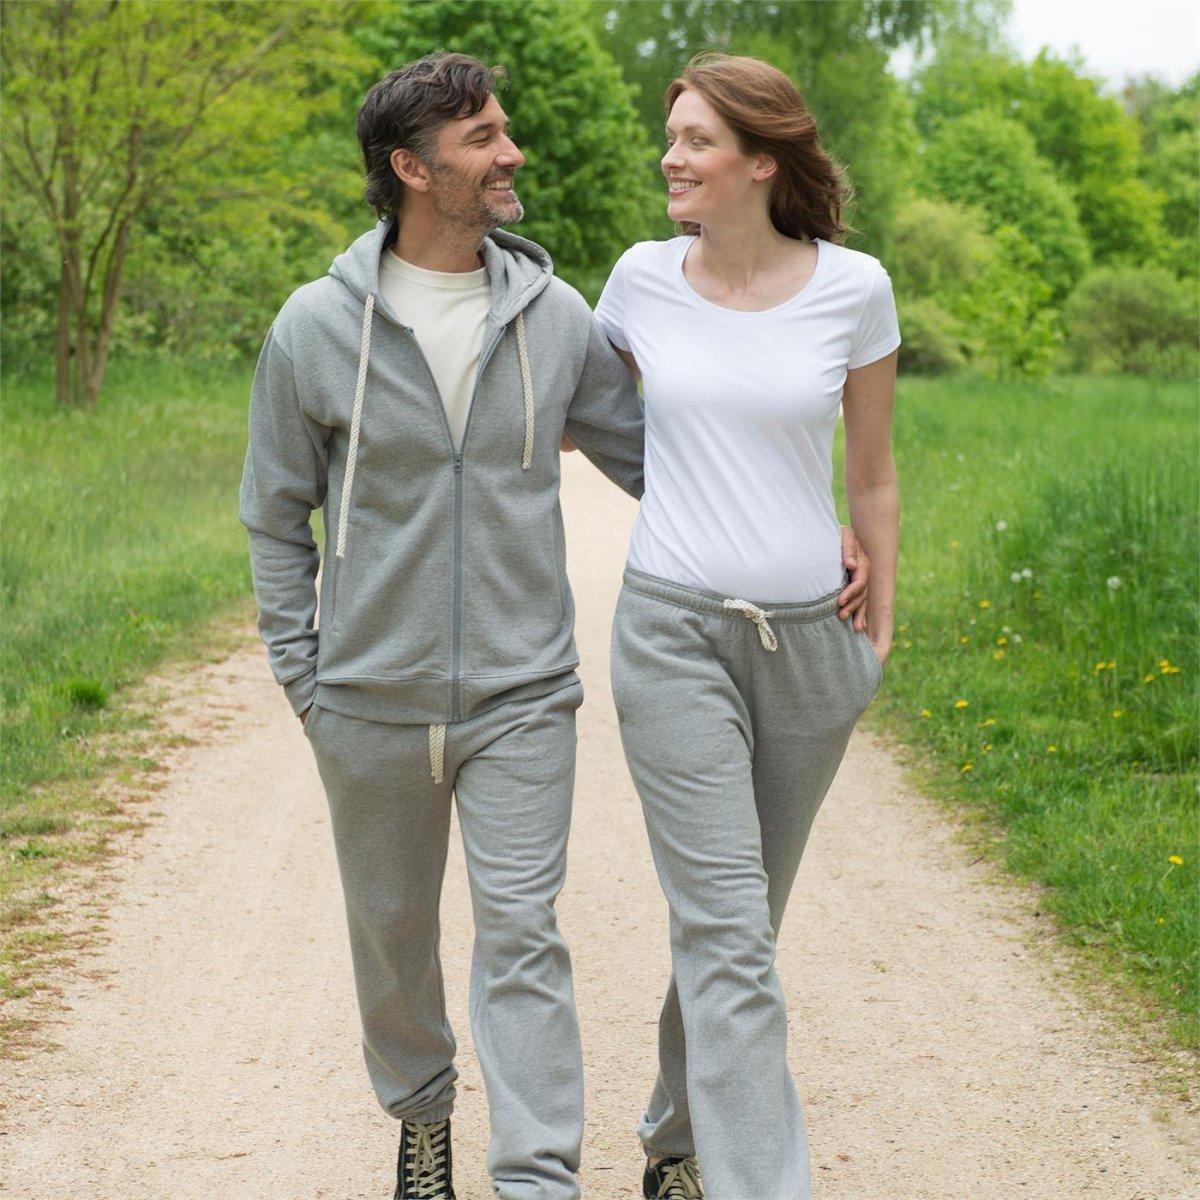 Pantalone tuta unisex in cotone biologico grigio